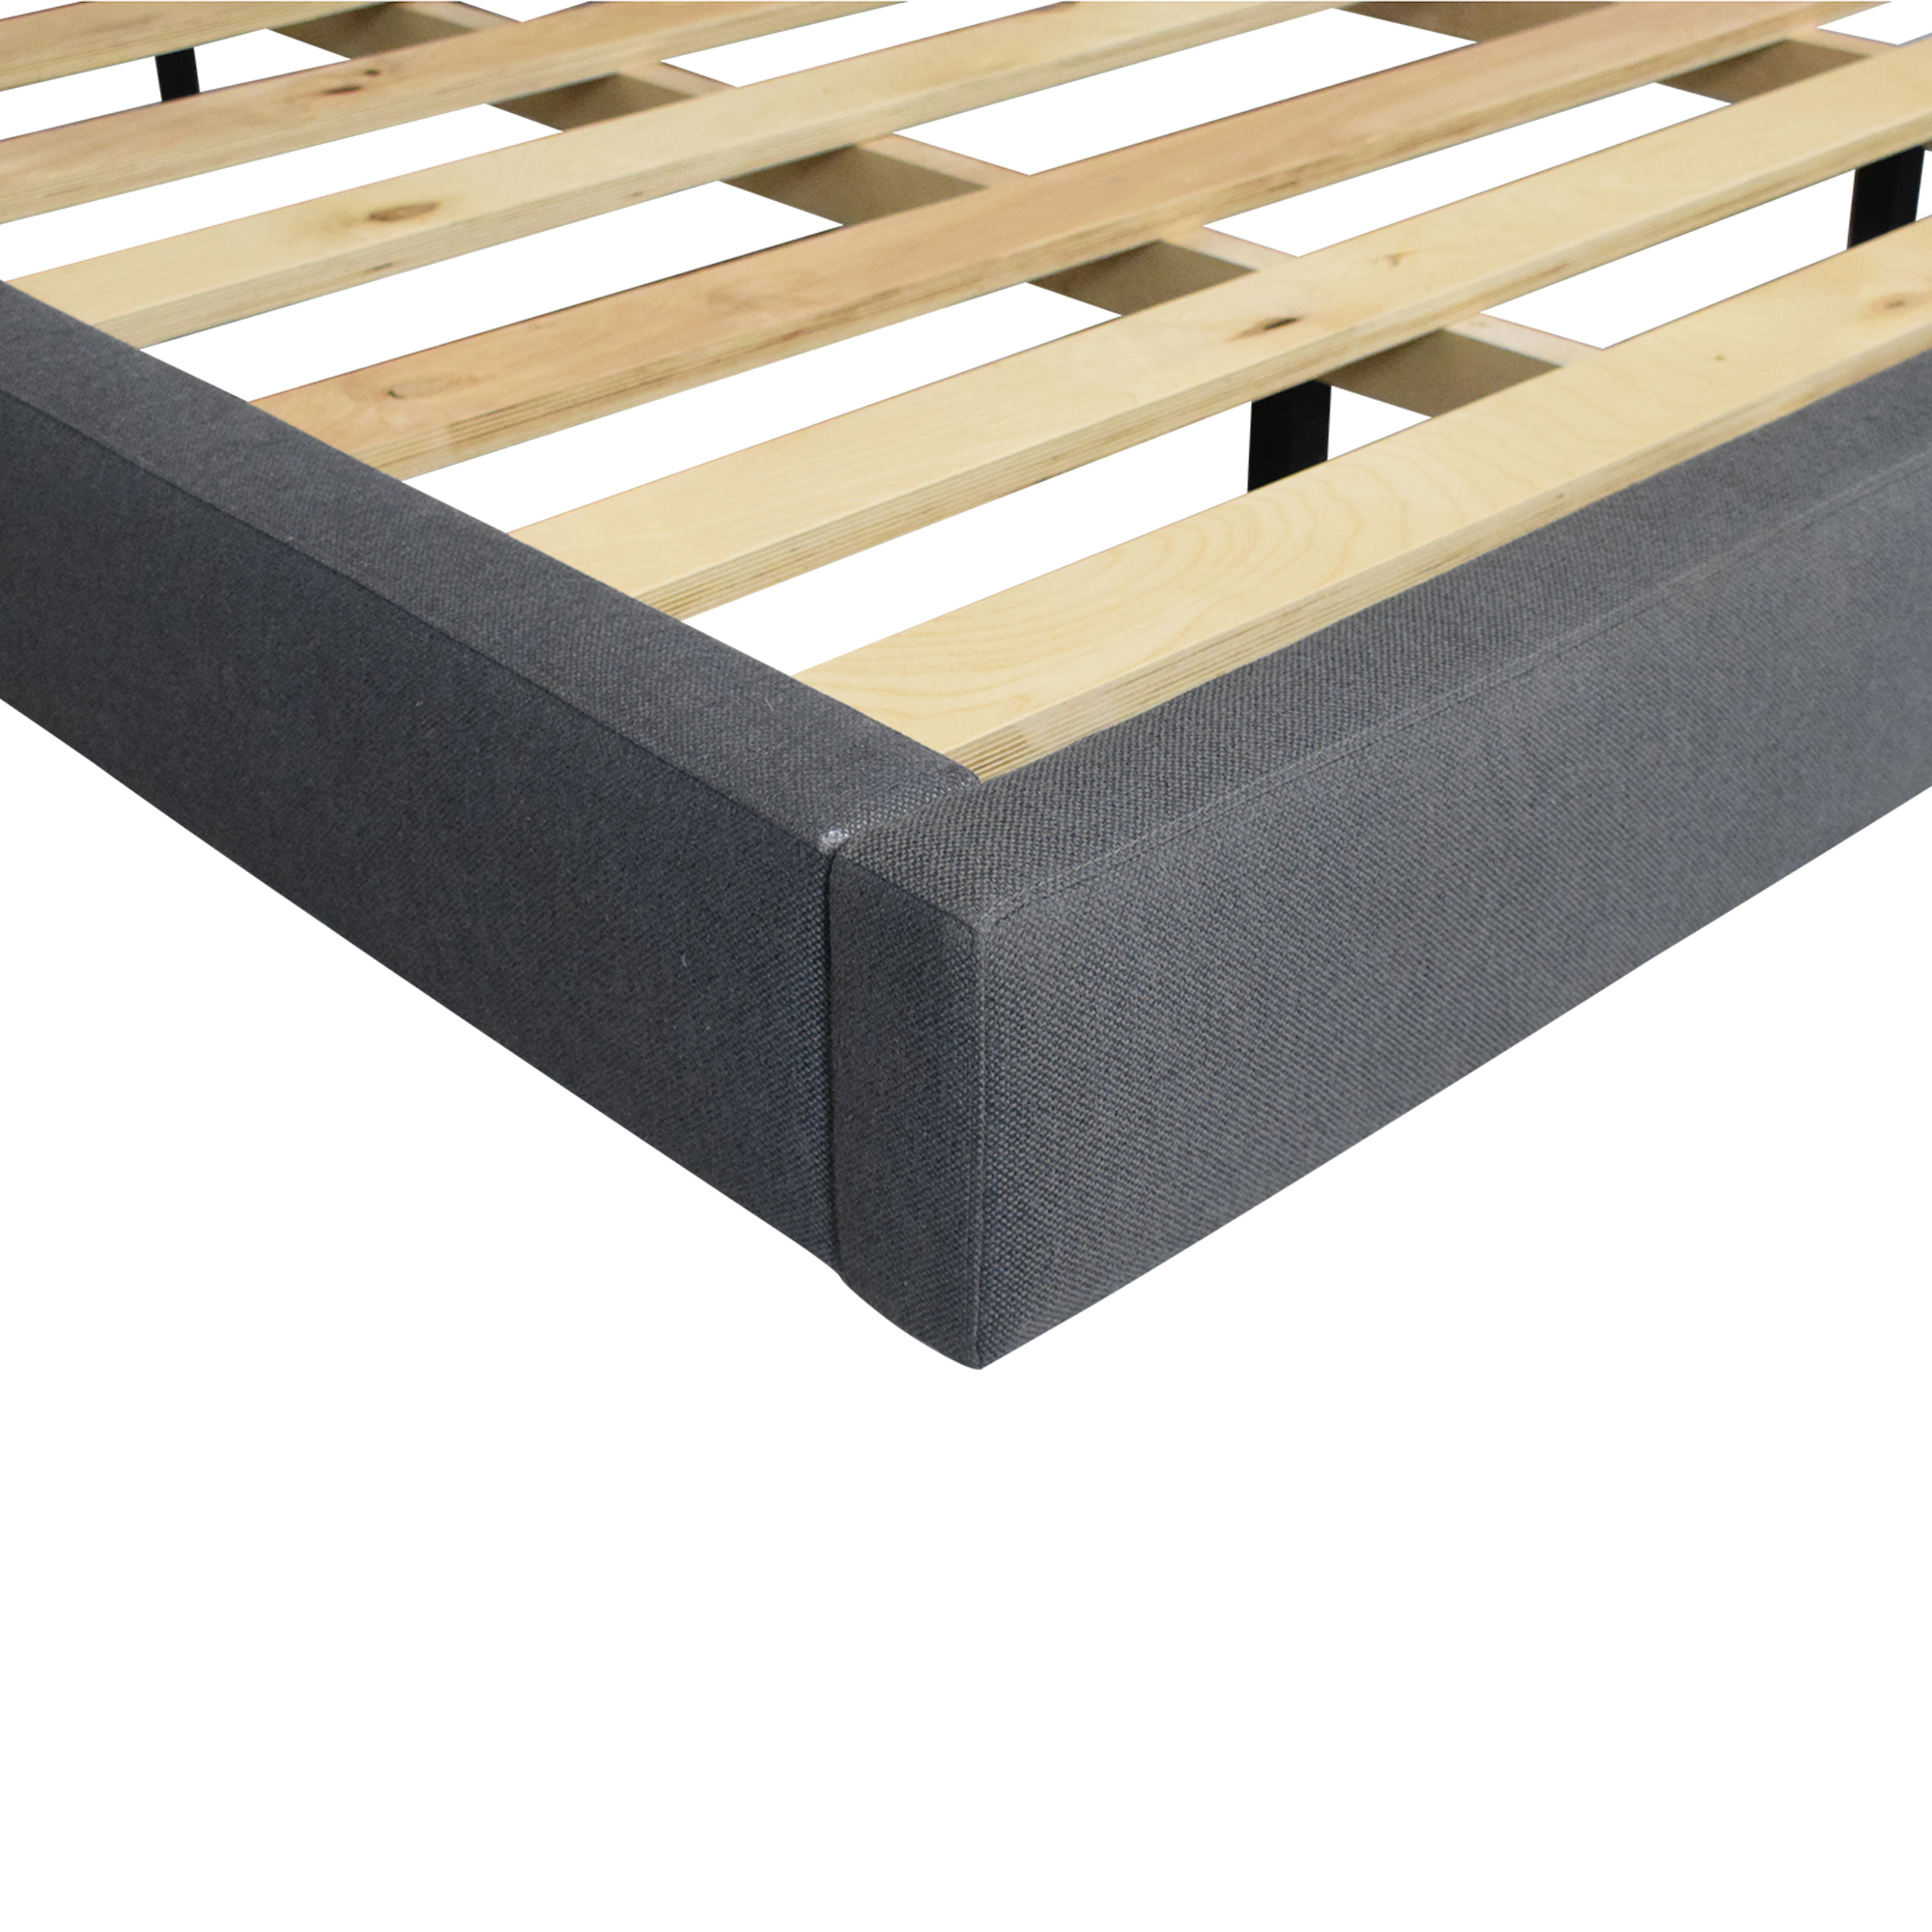 Crate & Barrel Crate & Barrel Tate California King Upholstered Bed dimensions